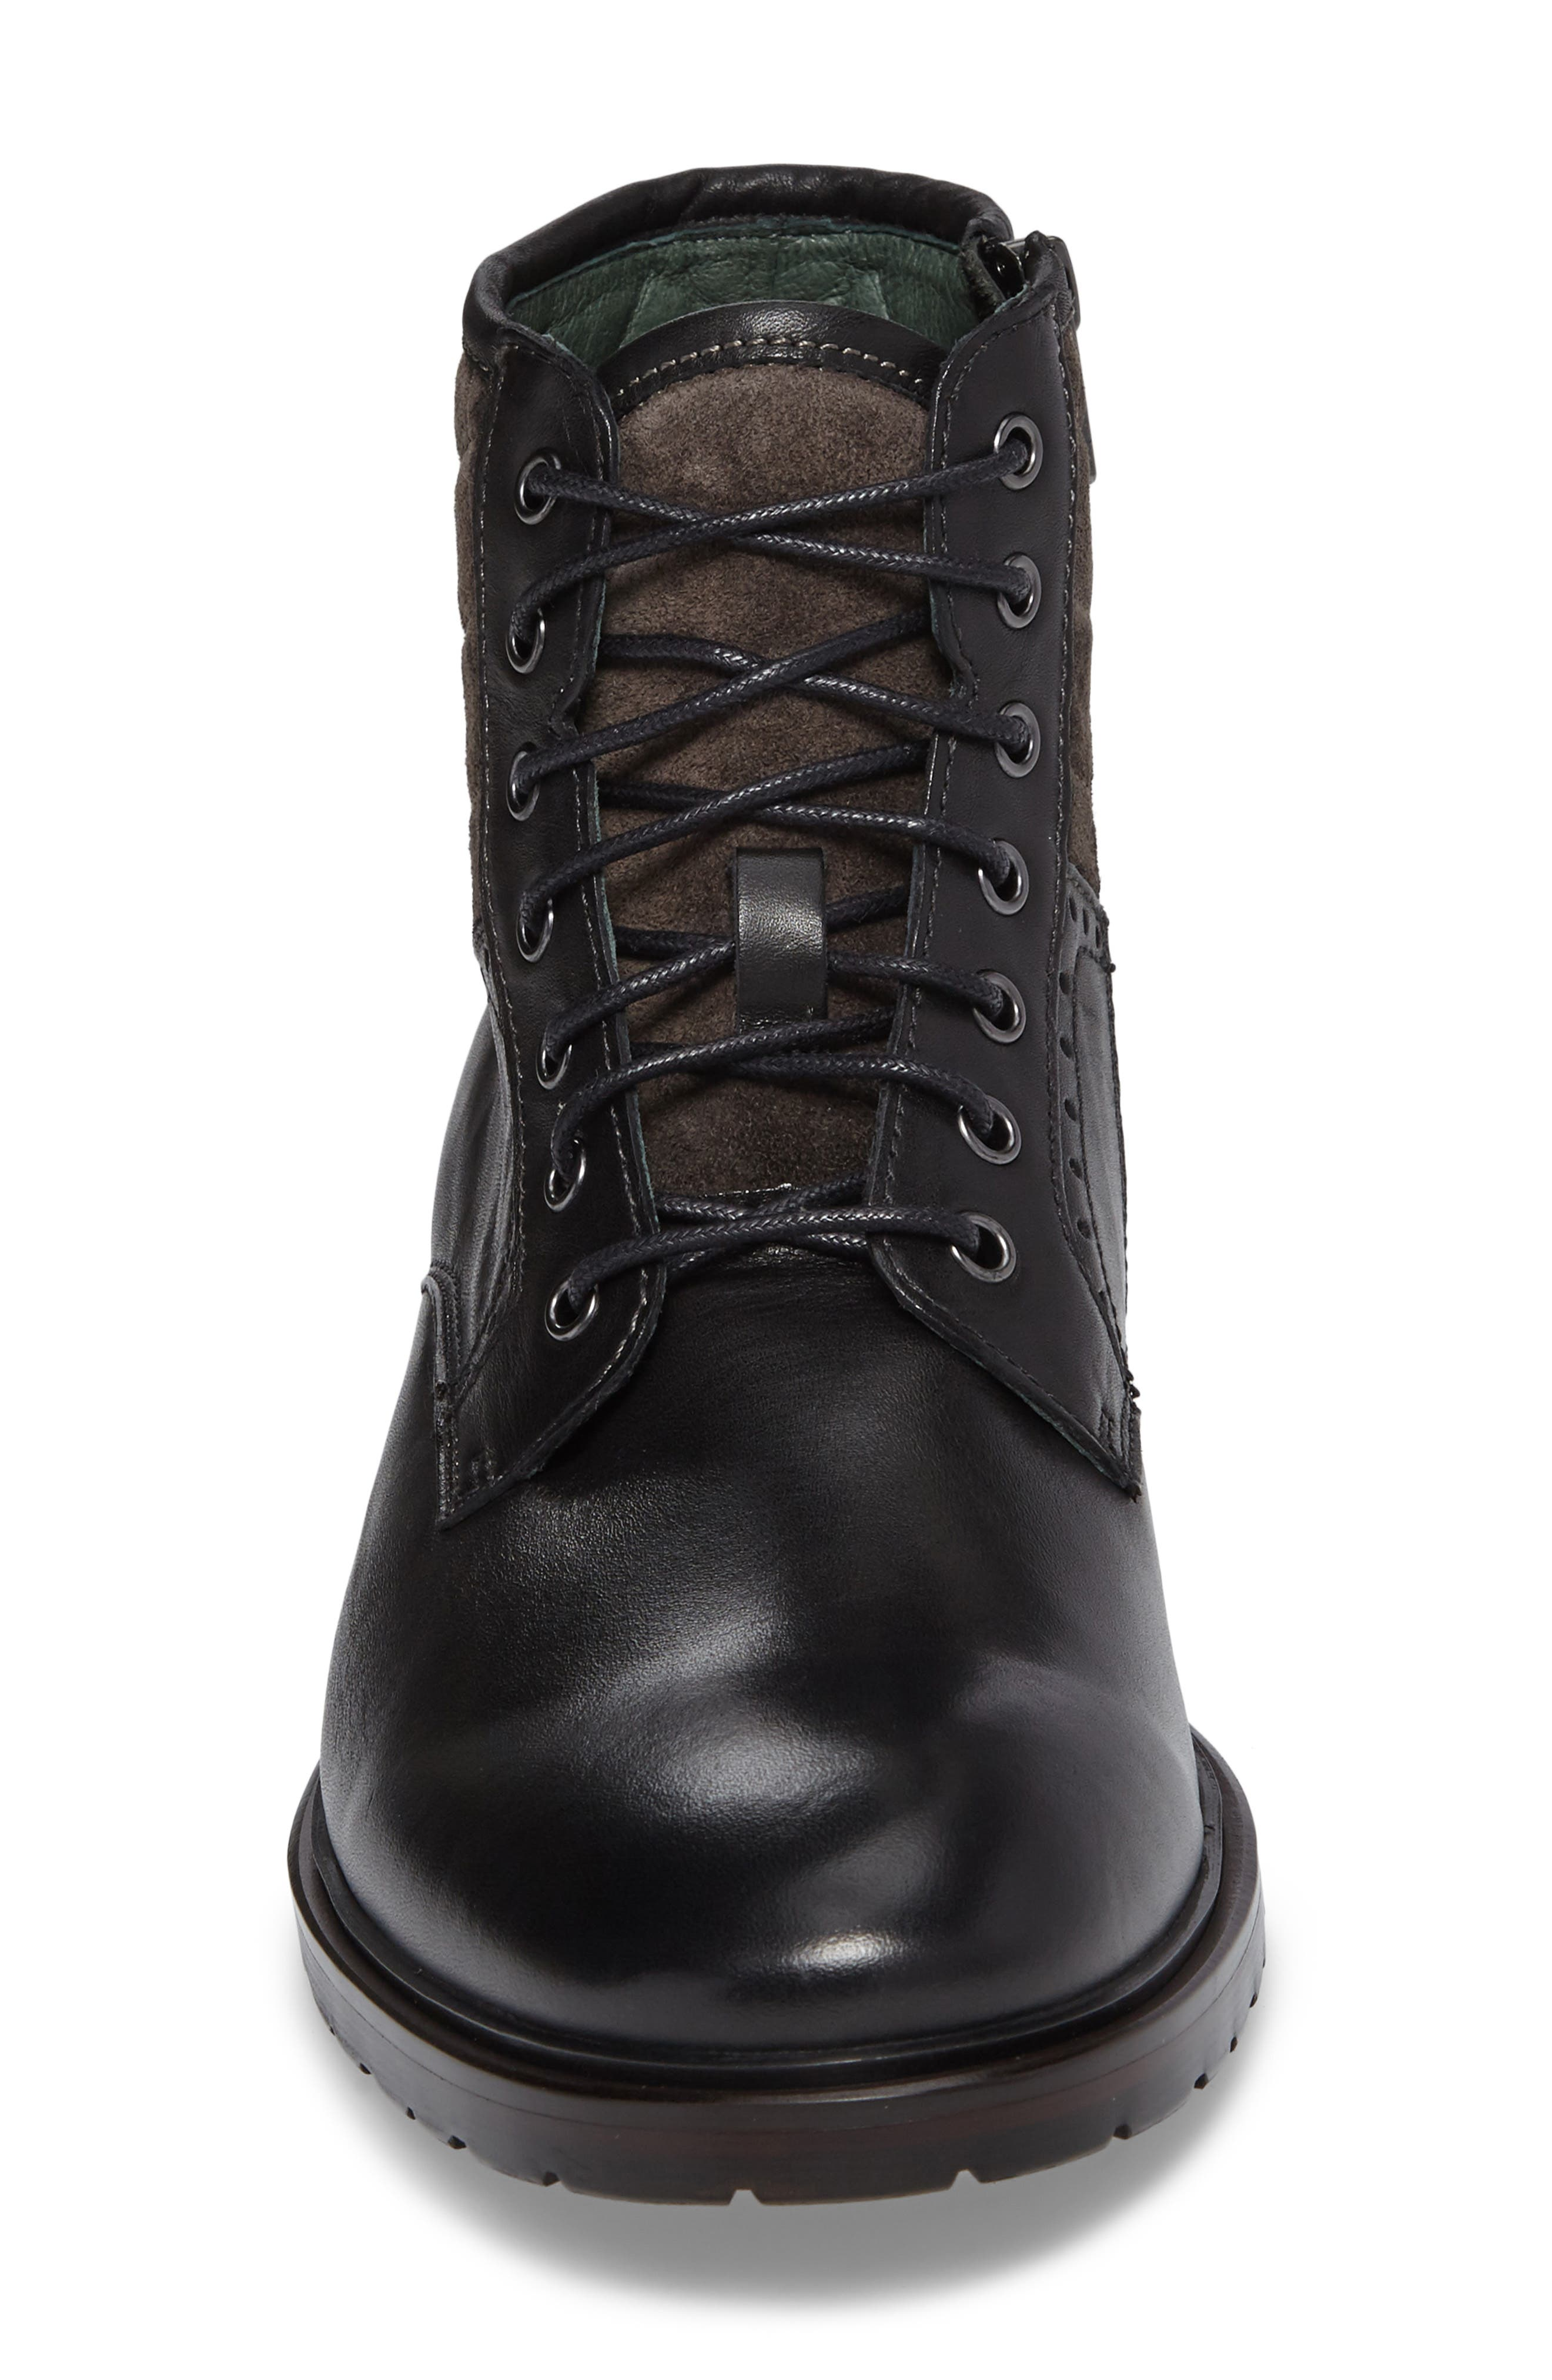 Myles Plain Toe Boot,                             Alternate thumbnail 4, color,                             Black Leather